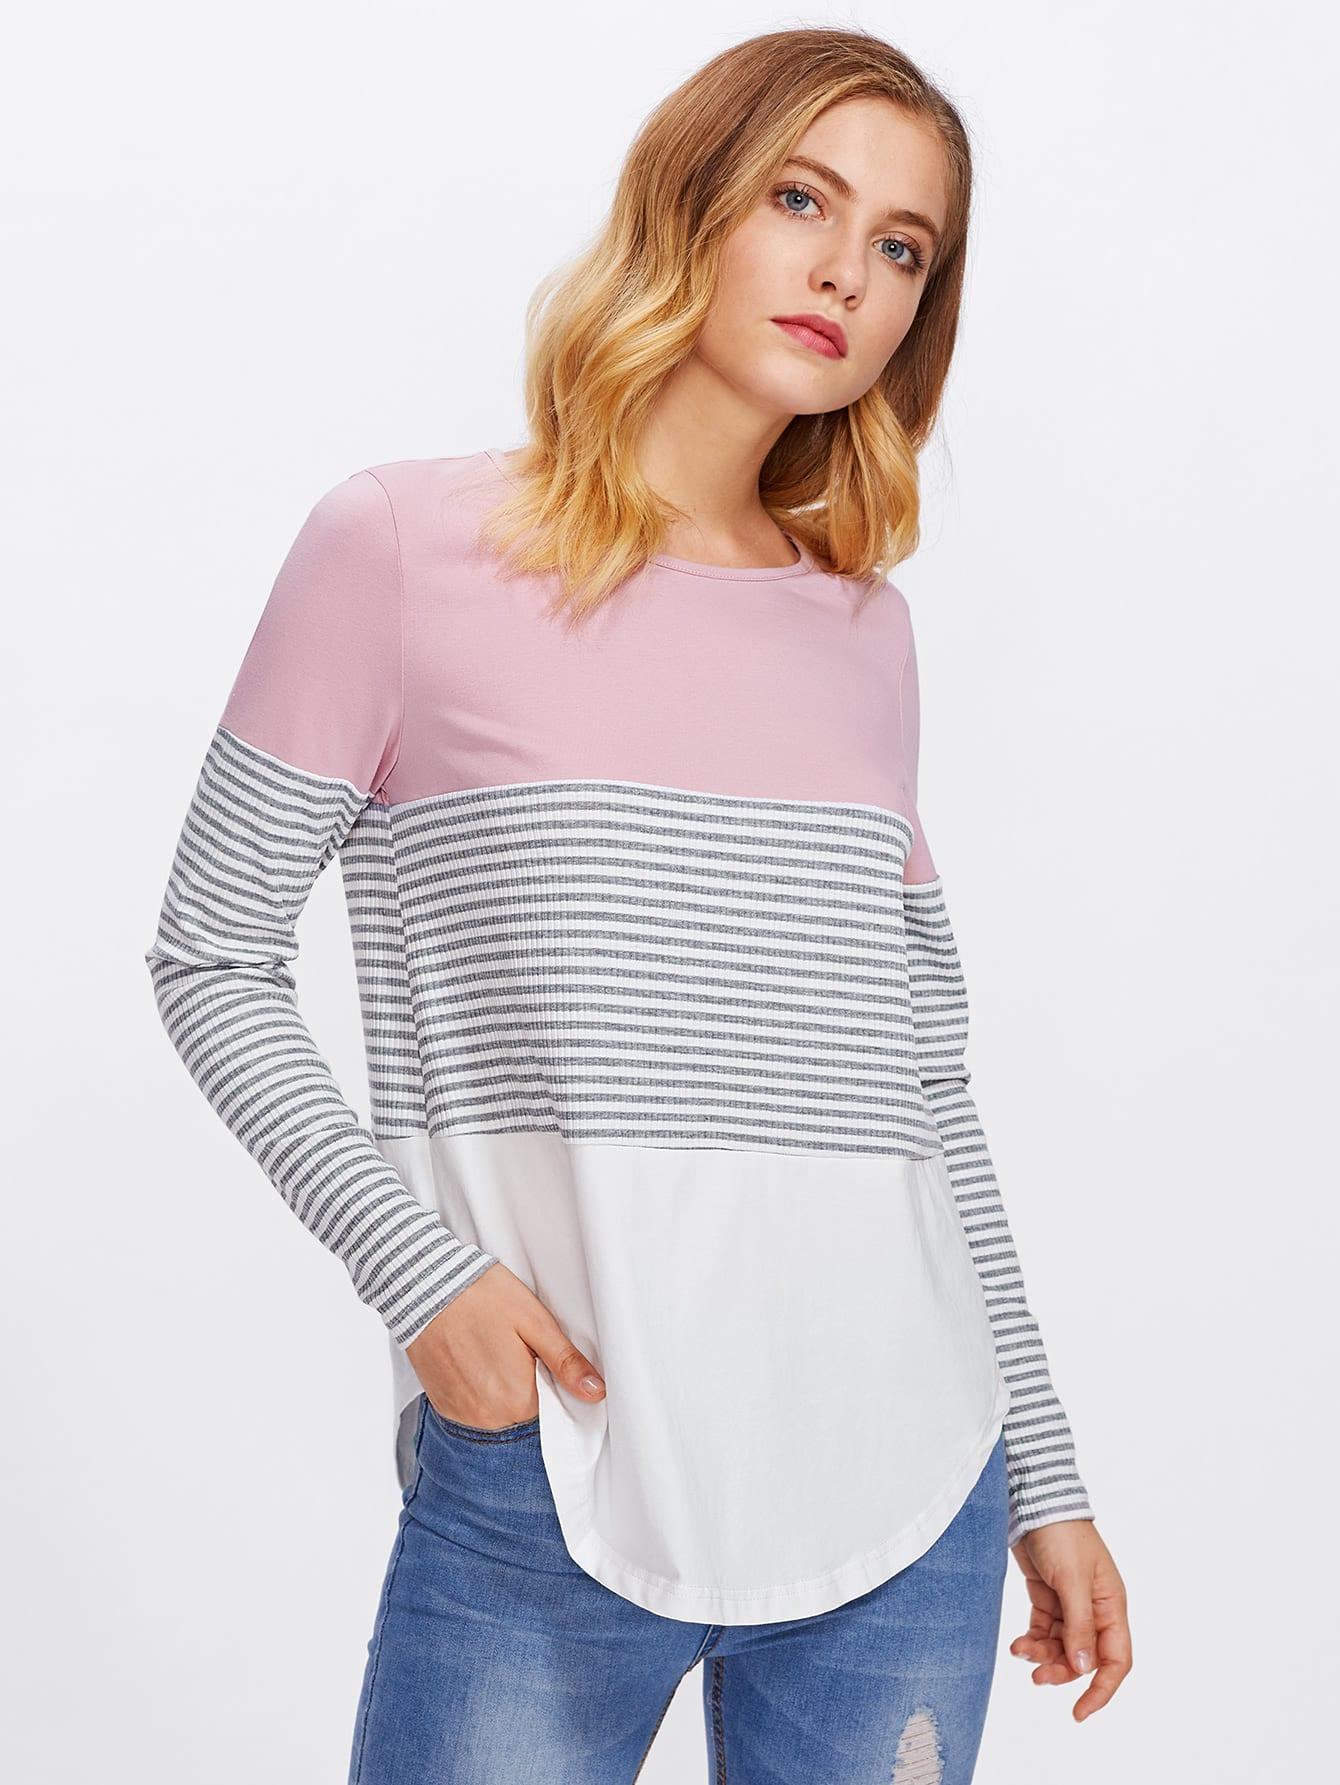 Striped Cut And Sew Curved Hem Tee striped cut and sew curved hem tee